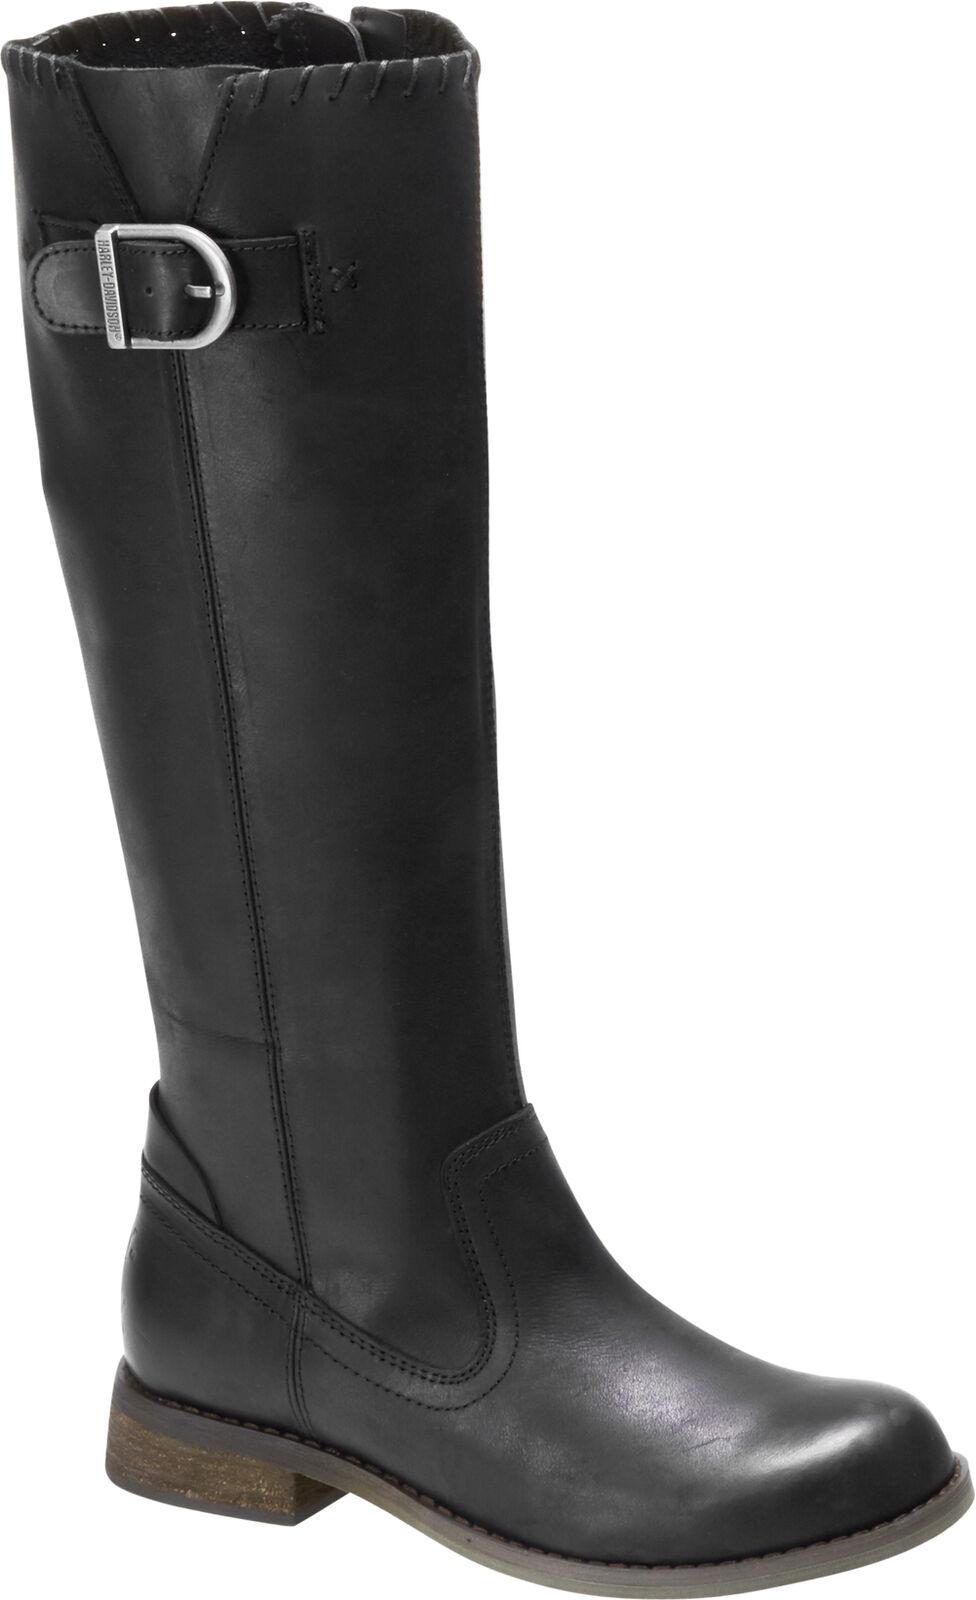 Harley-Davidson Women's Keyser 15-Inch Black or Brown Motorcycle Boots D84484